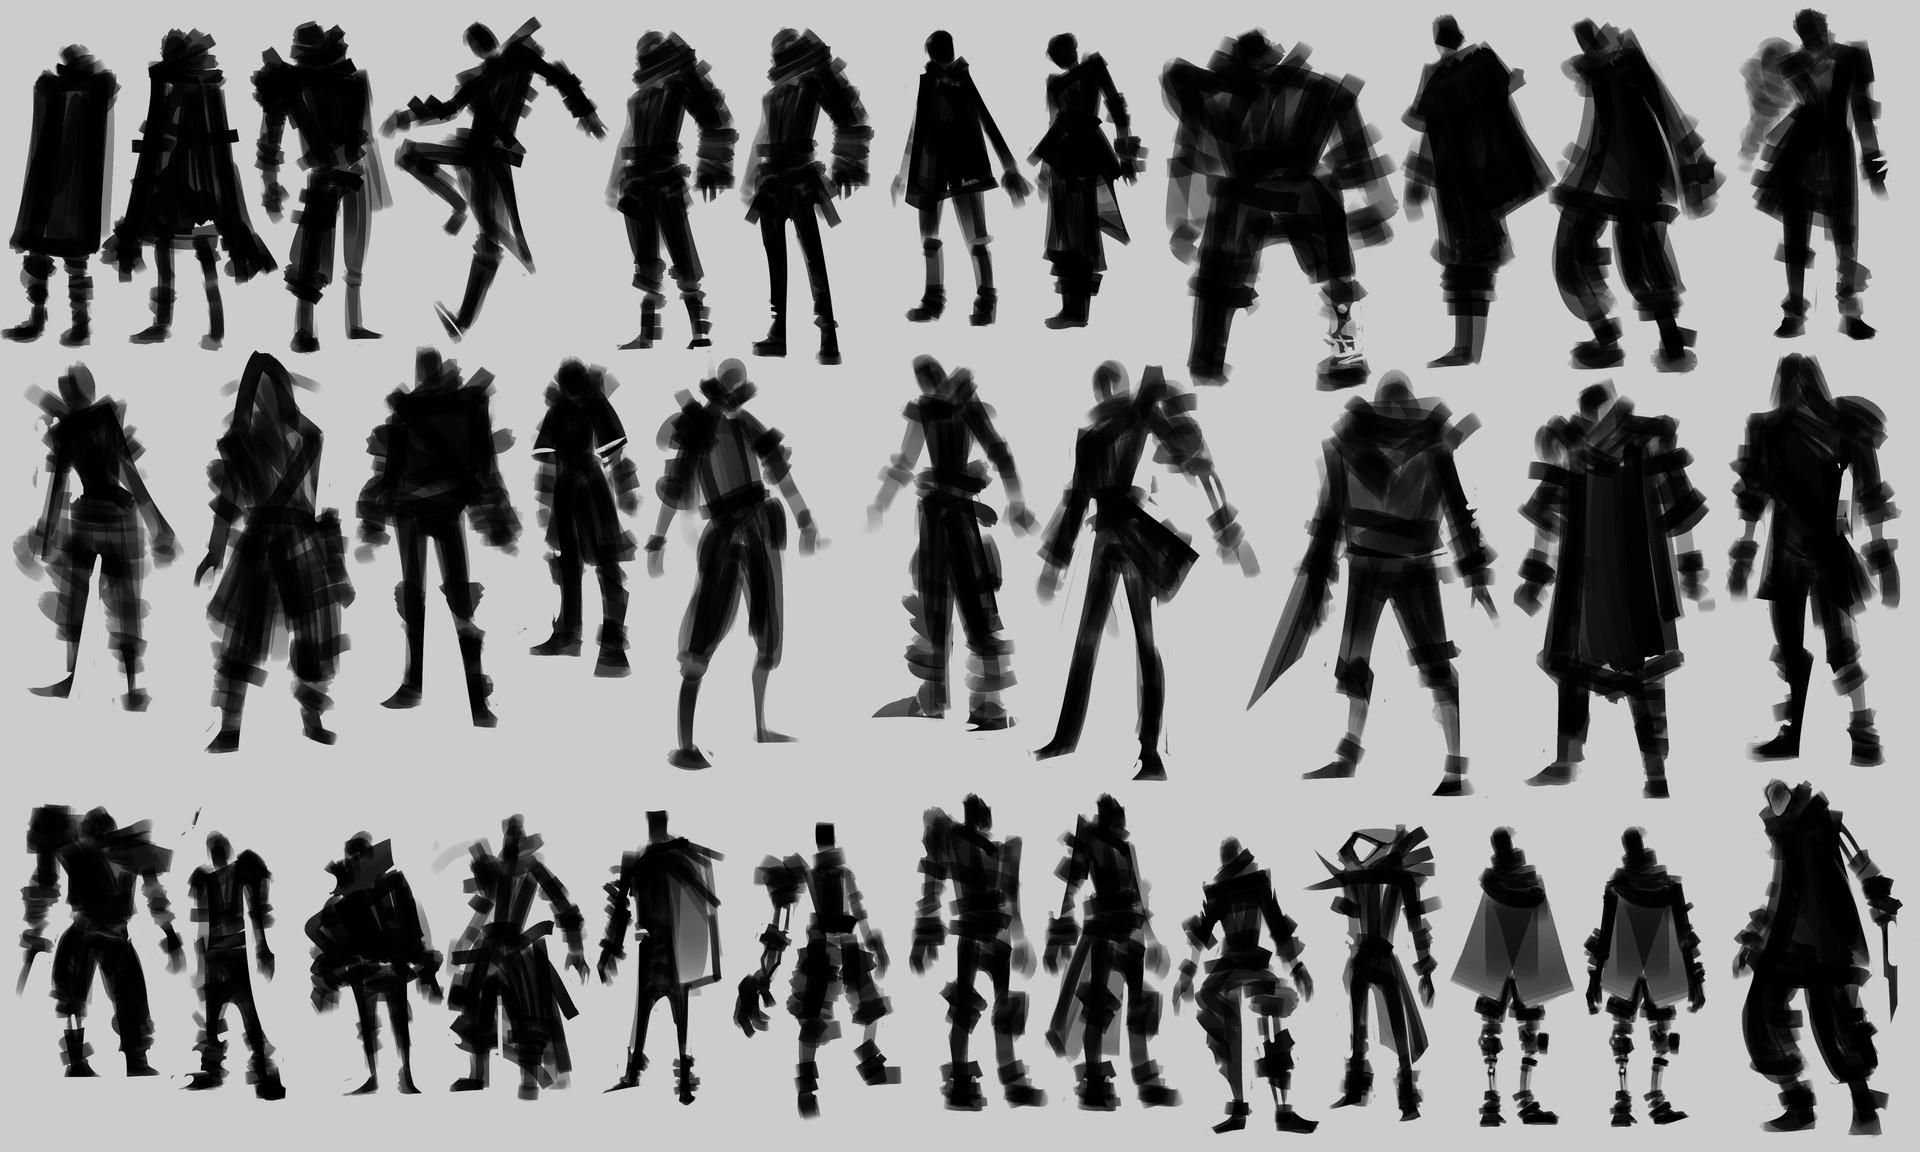 Sophia manio characterdesign silhouettes01